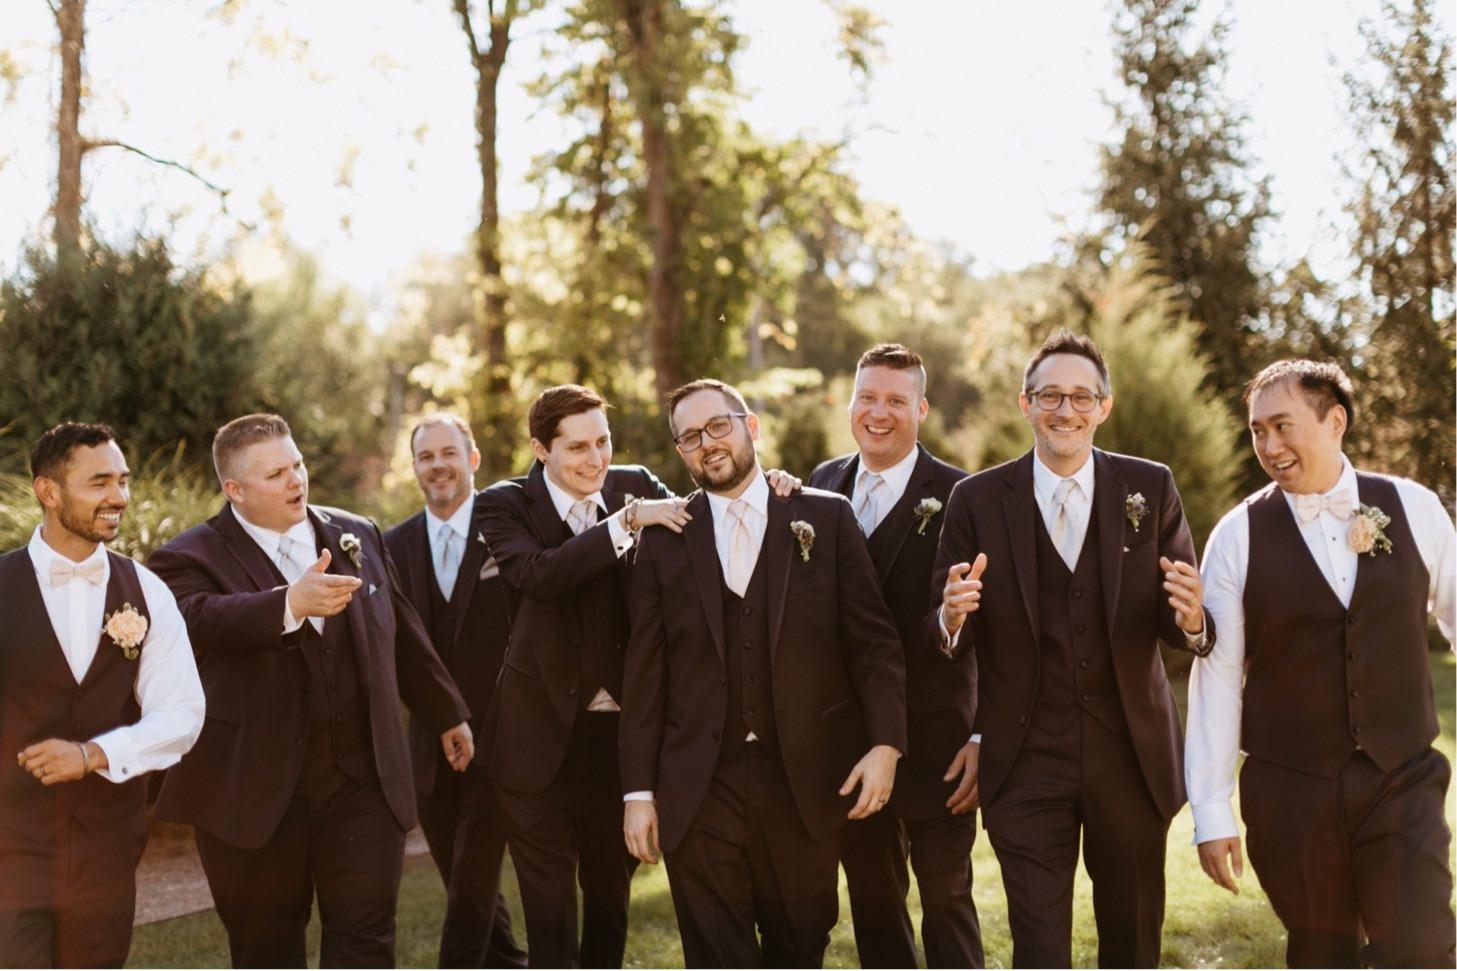 ritz-charles-wedding-reception-downtown-indianapolis-wedding-photographer018.JPG